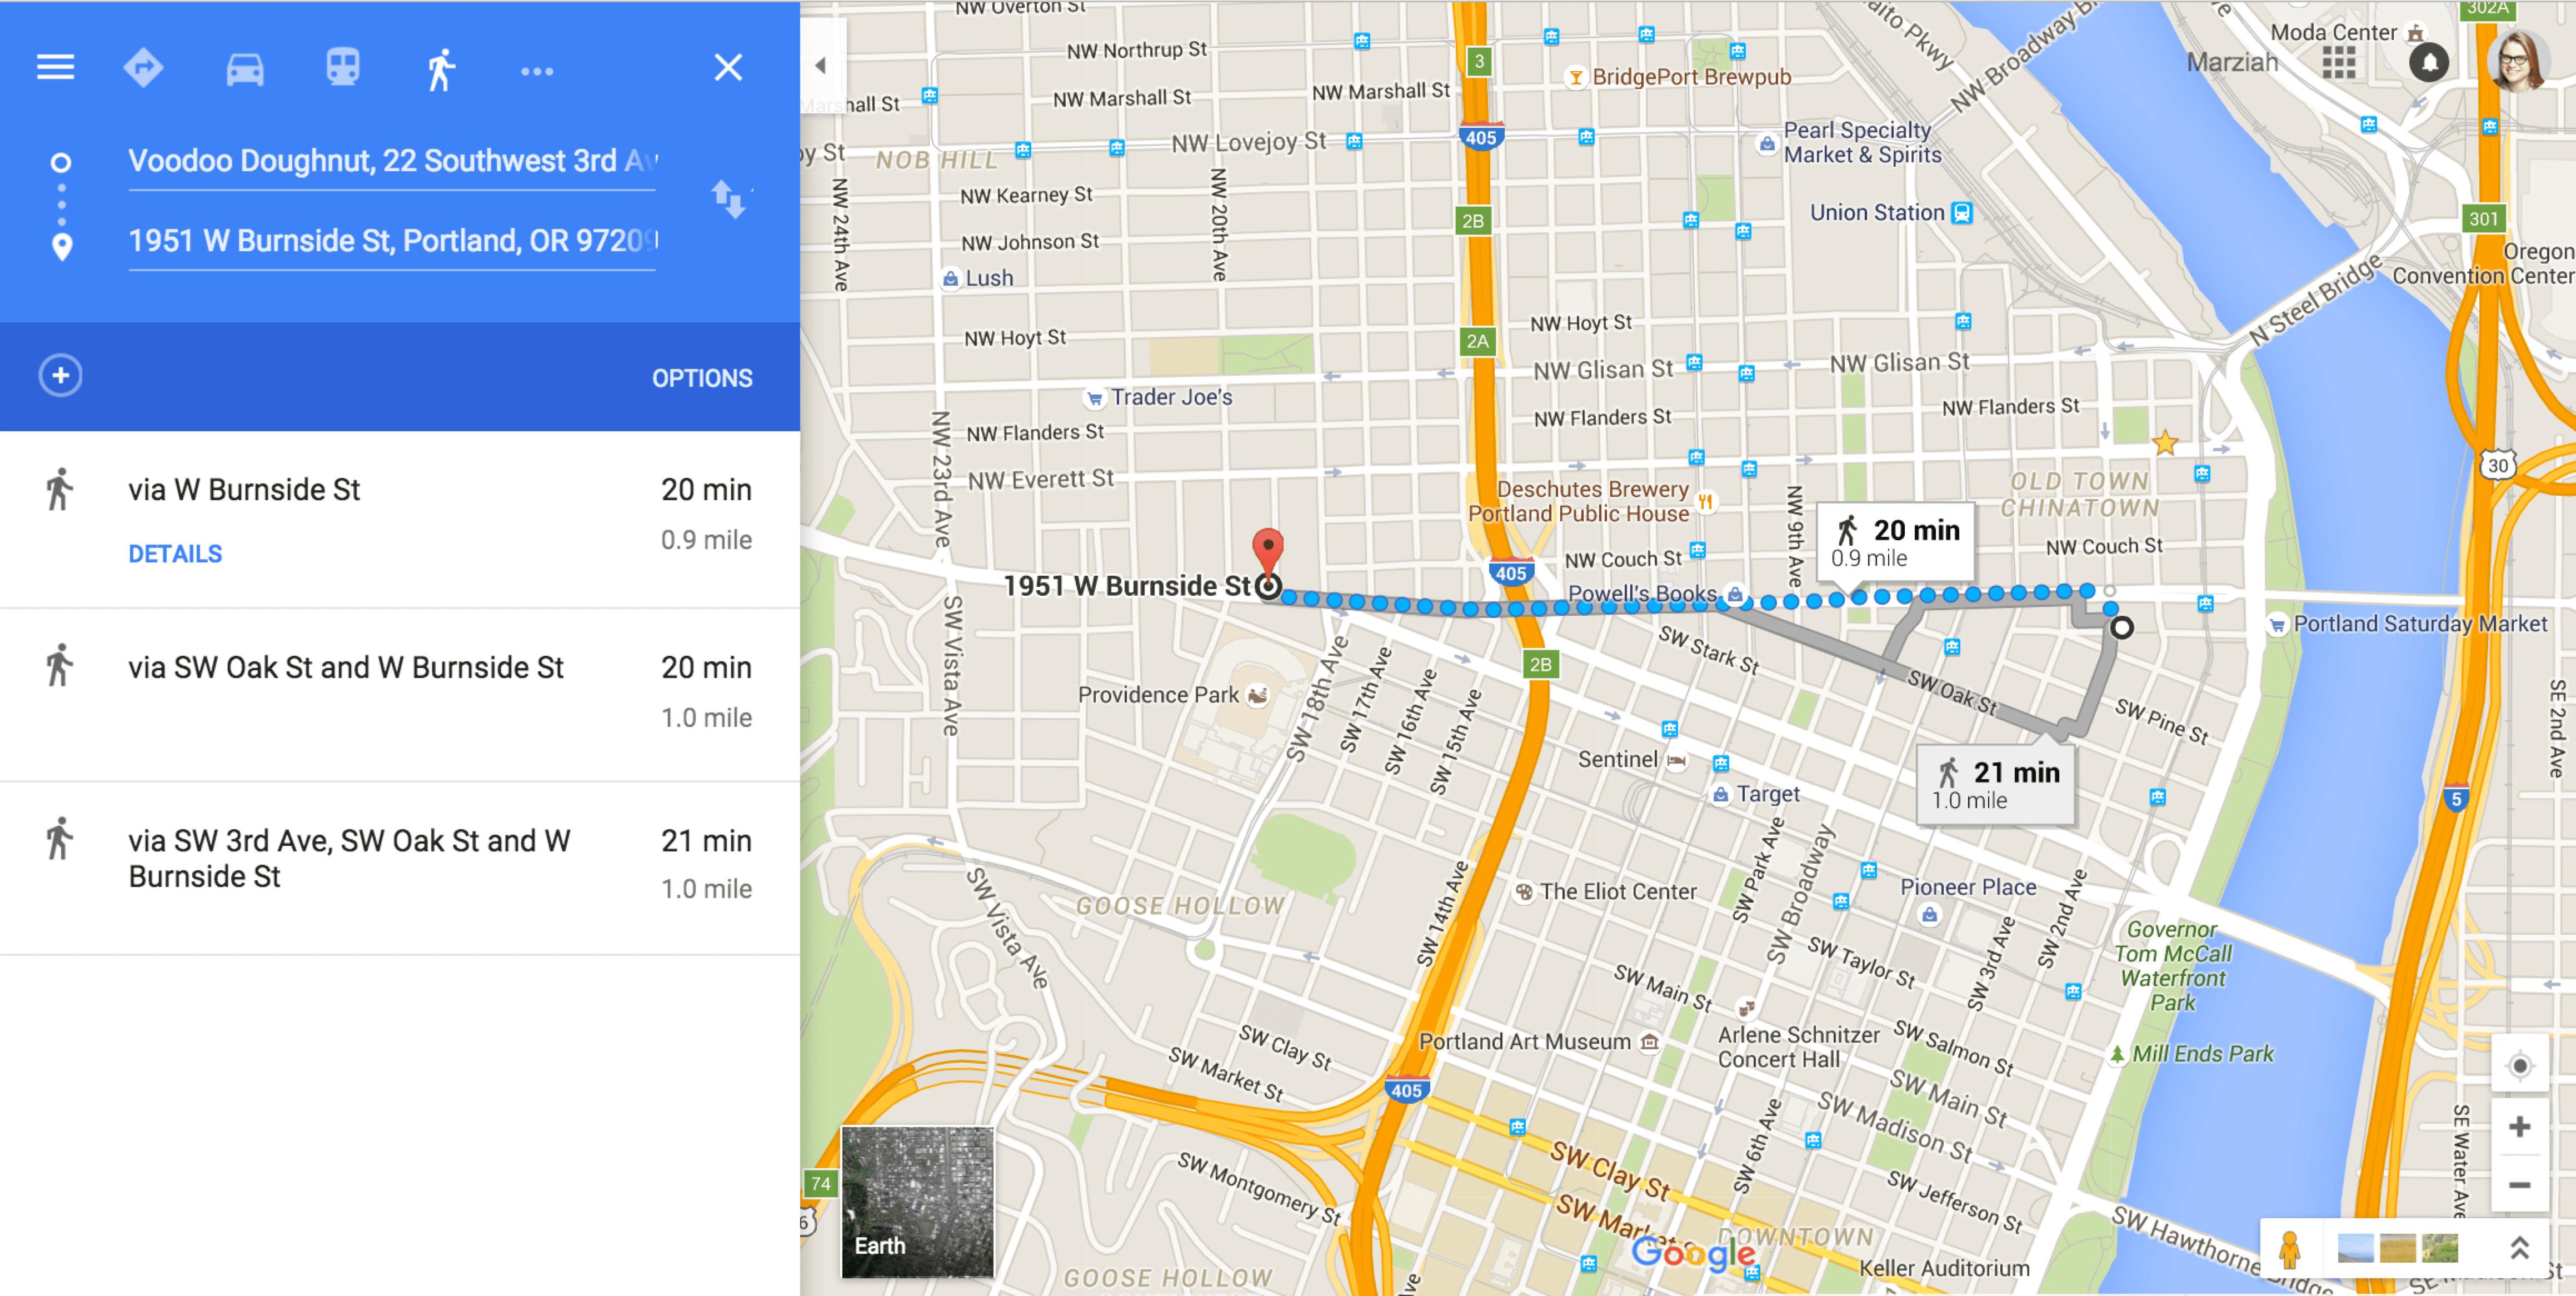 Google Maps San Diego California Printable Maps Google Maps Canada - Printable Map Directions